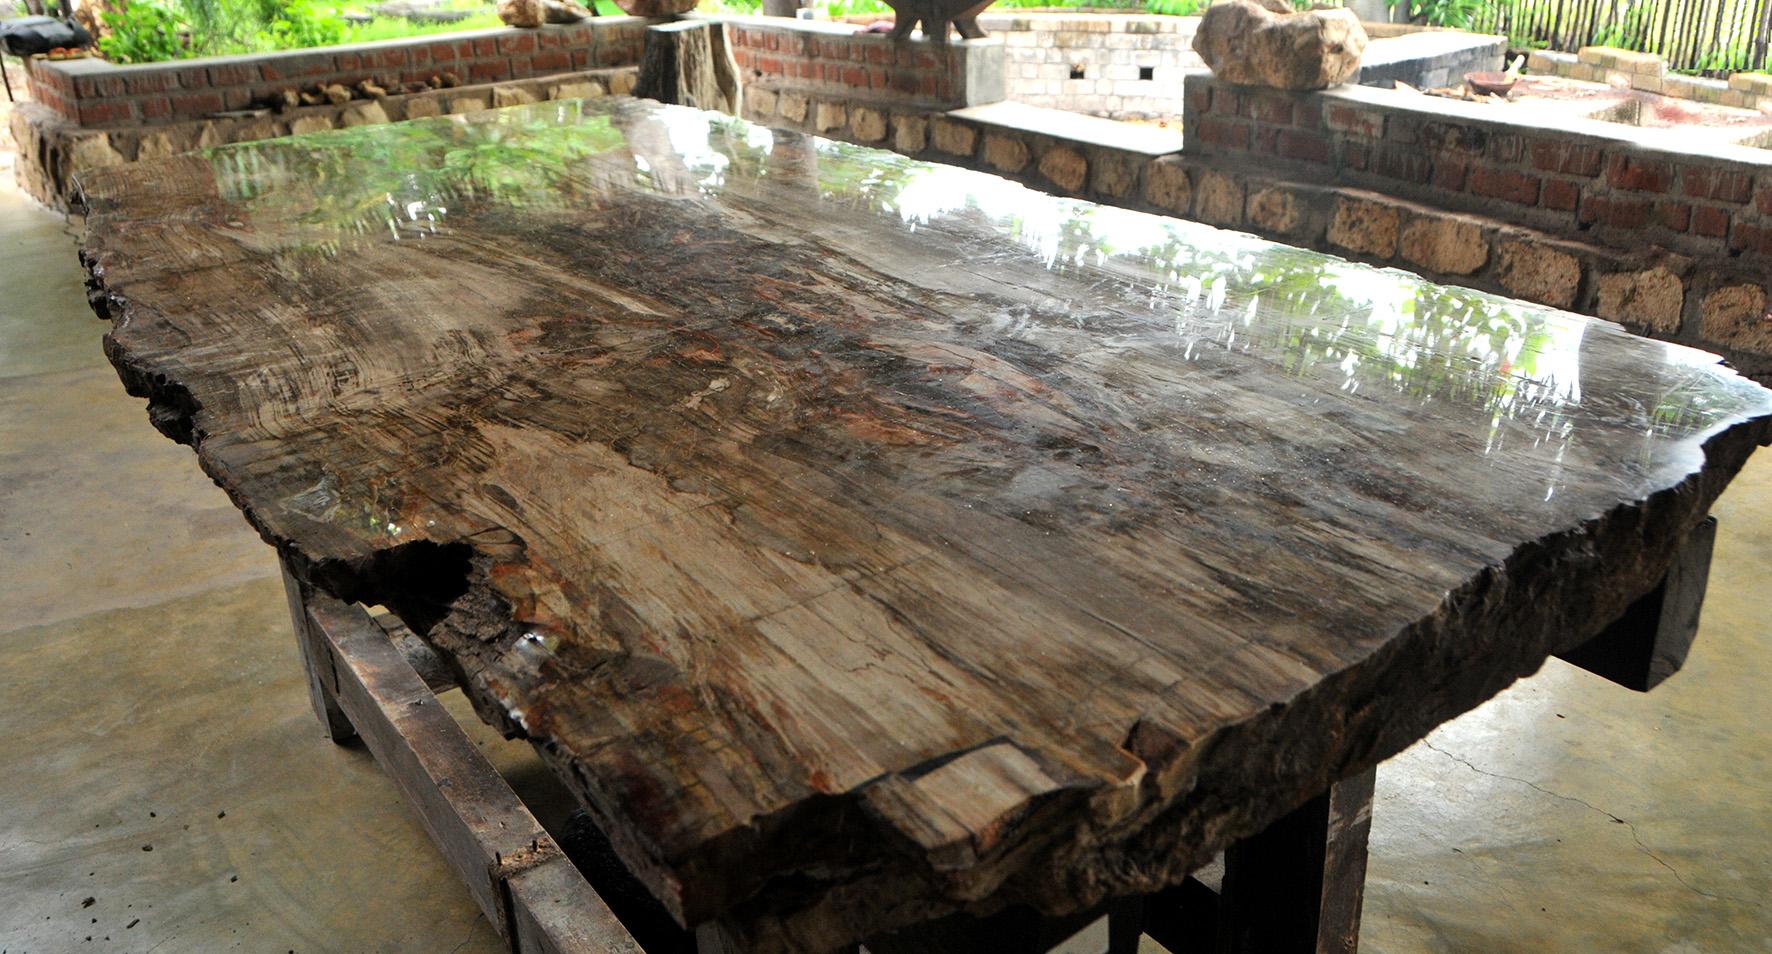 petrified wood table board download petrified wood table